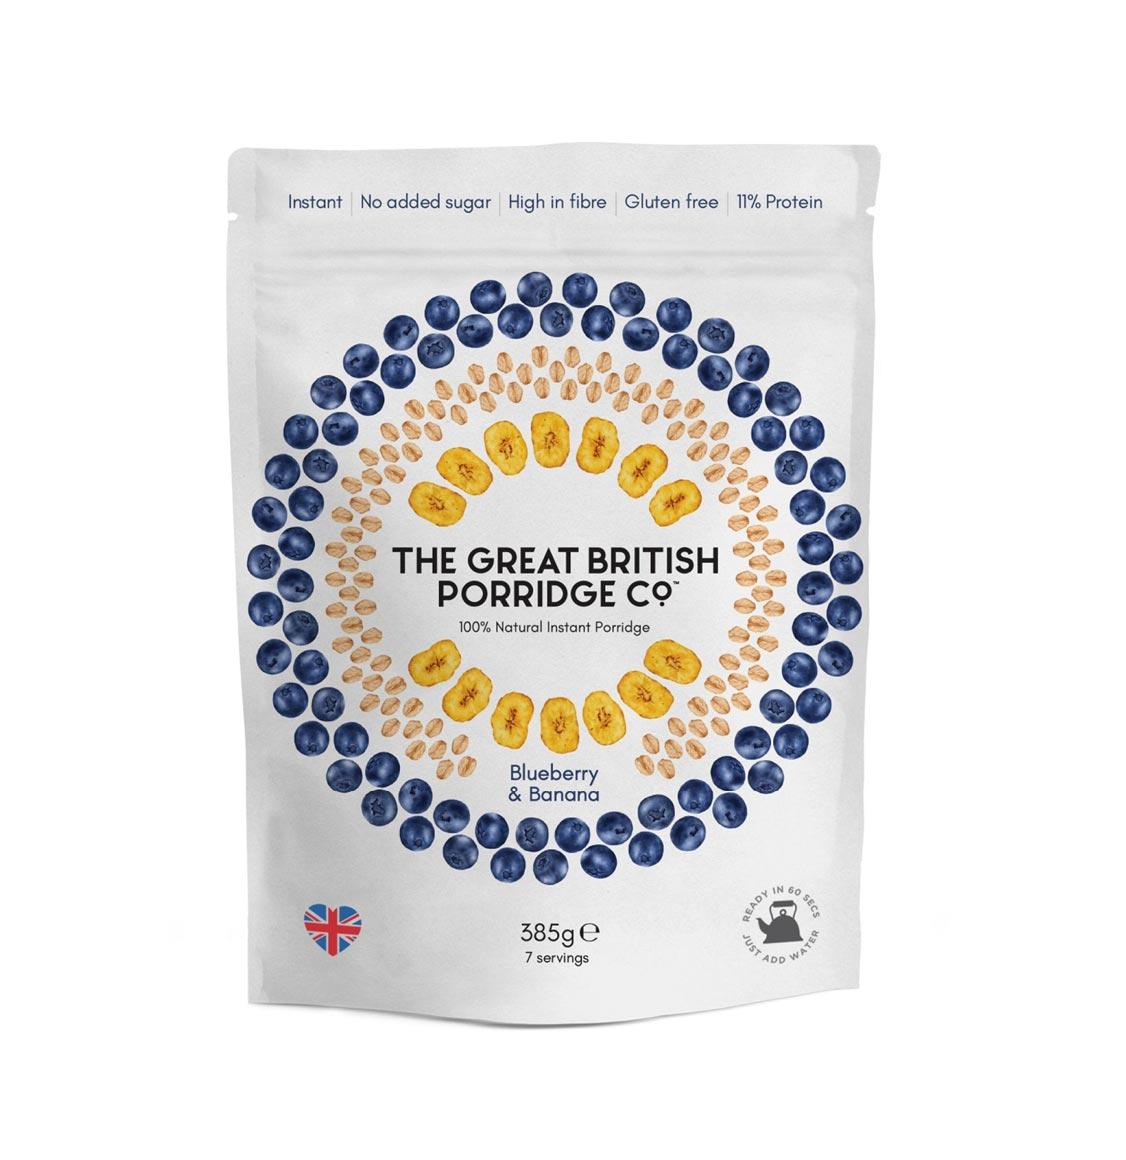 The Great British Porridge Blueberry Banana 385g